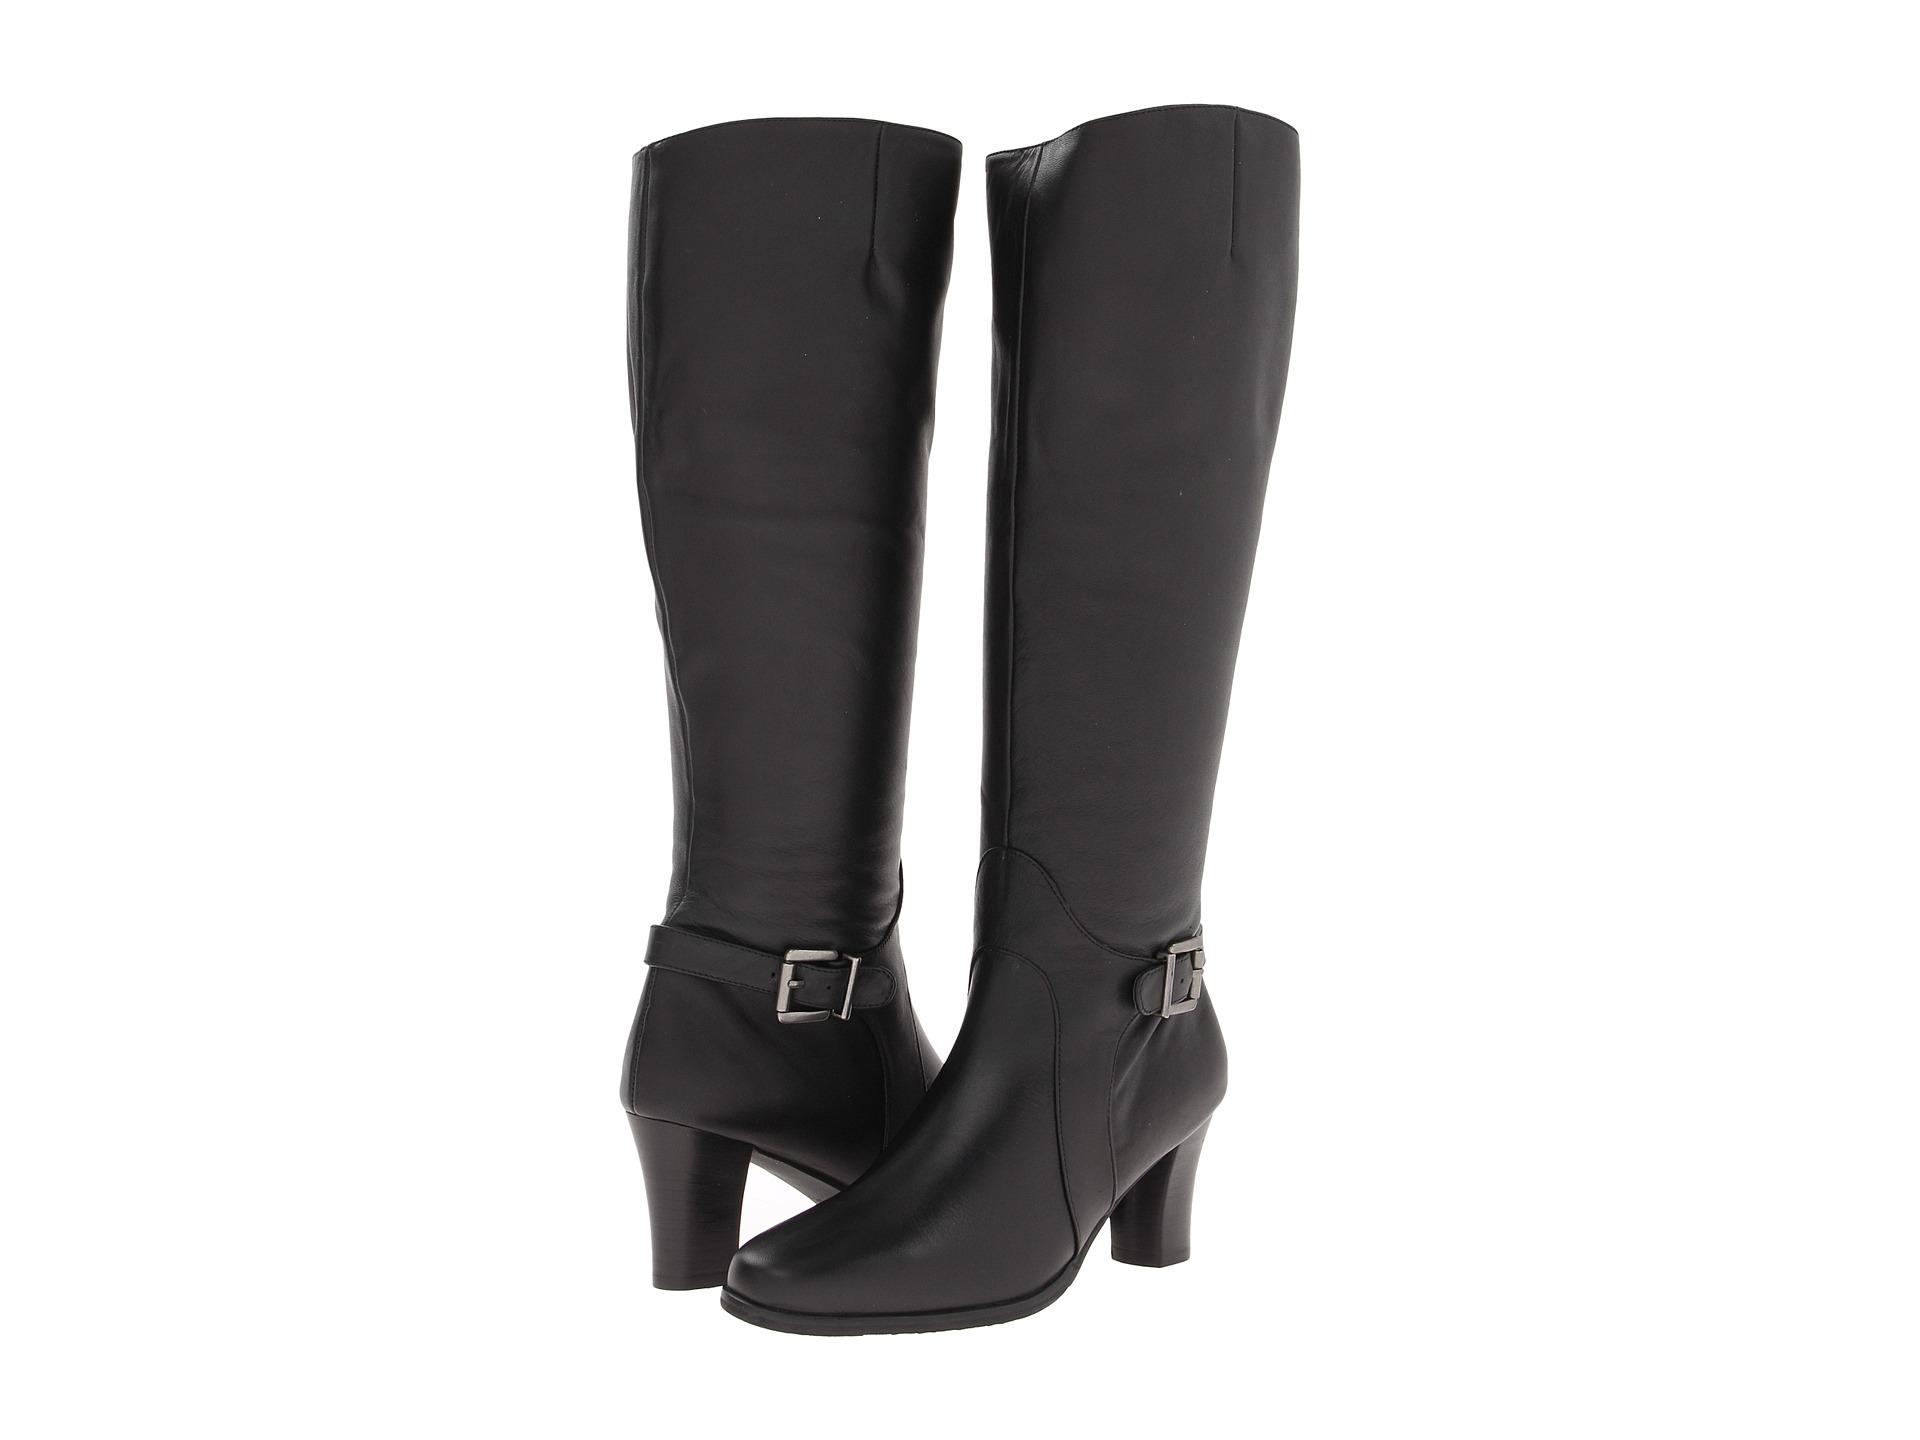 fbc0b4c26b6 Ros Hommerson Tazmin Extra Wide Calf Knee High Boot Black Leathe